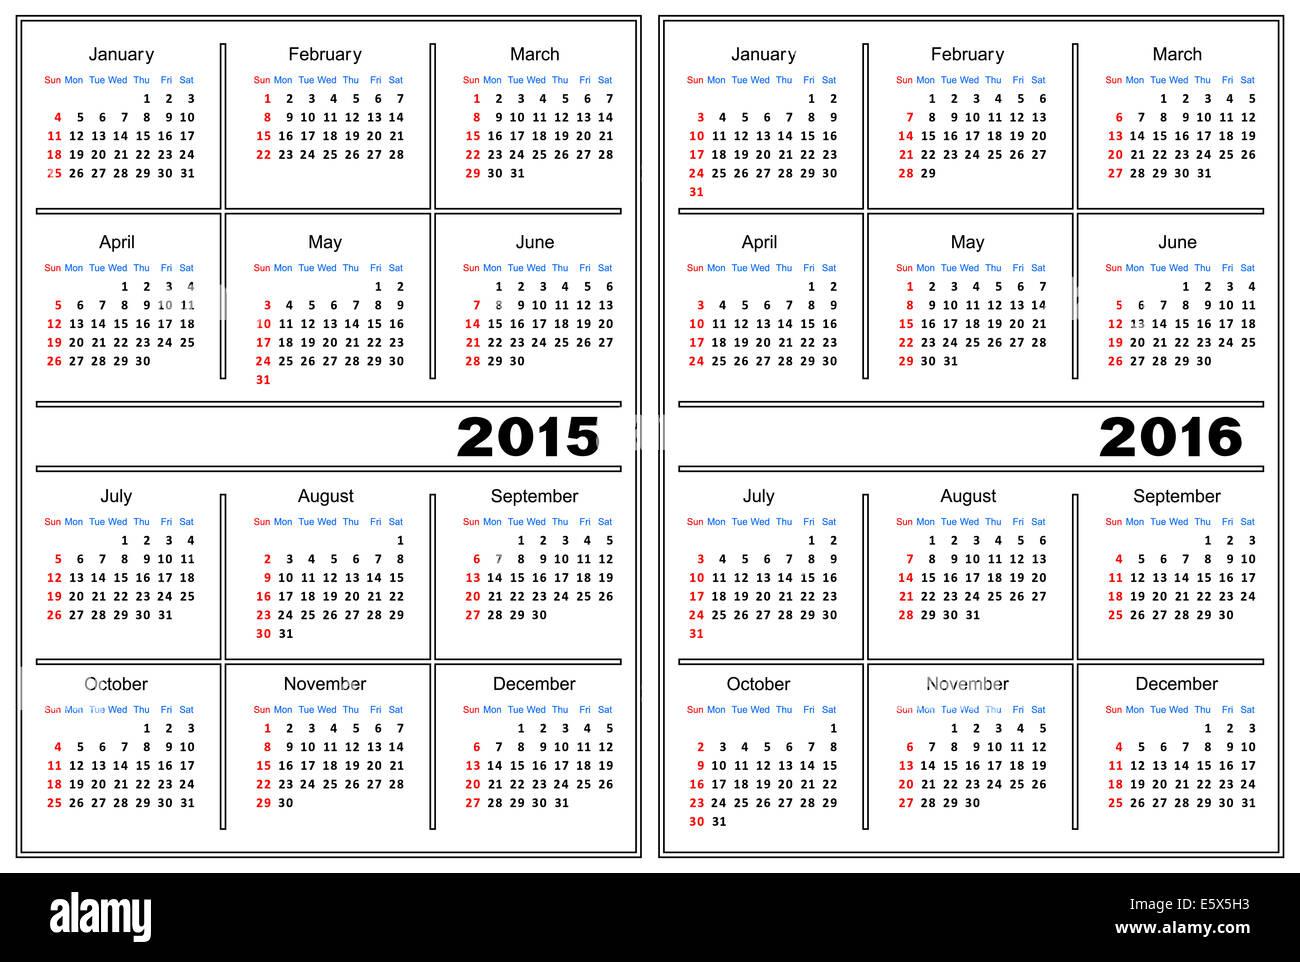 Calendar Template 2015 2016 Stock Photos Calendar Template 2015